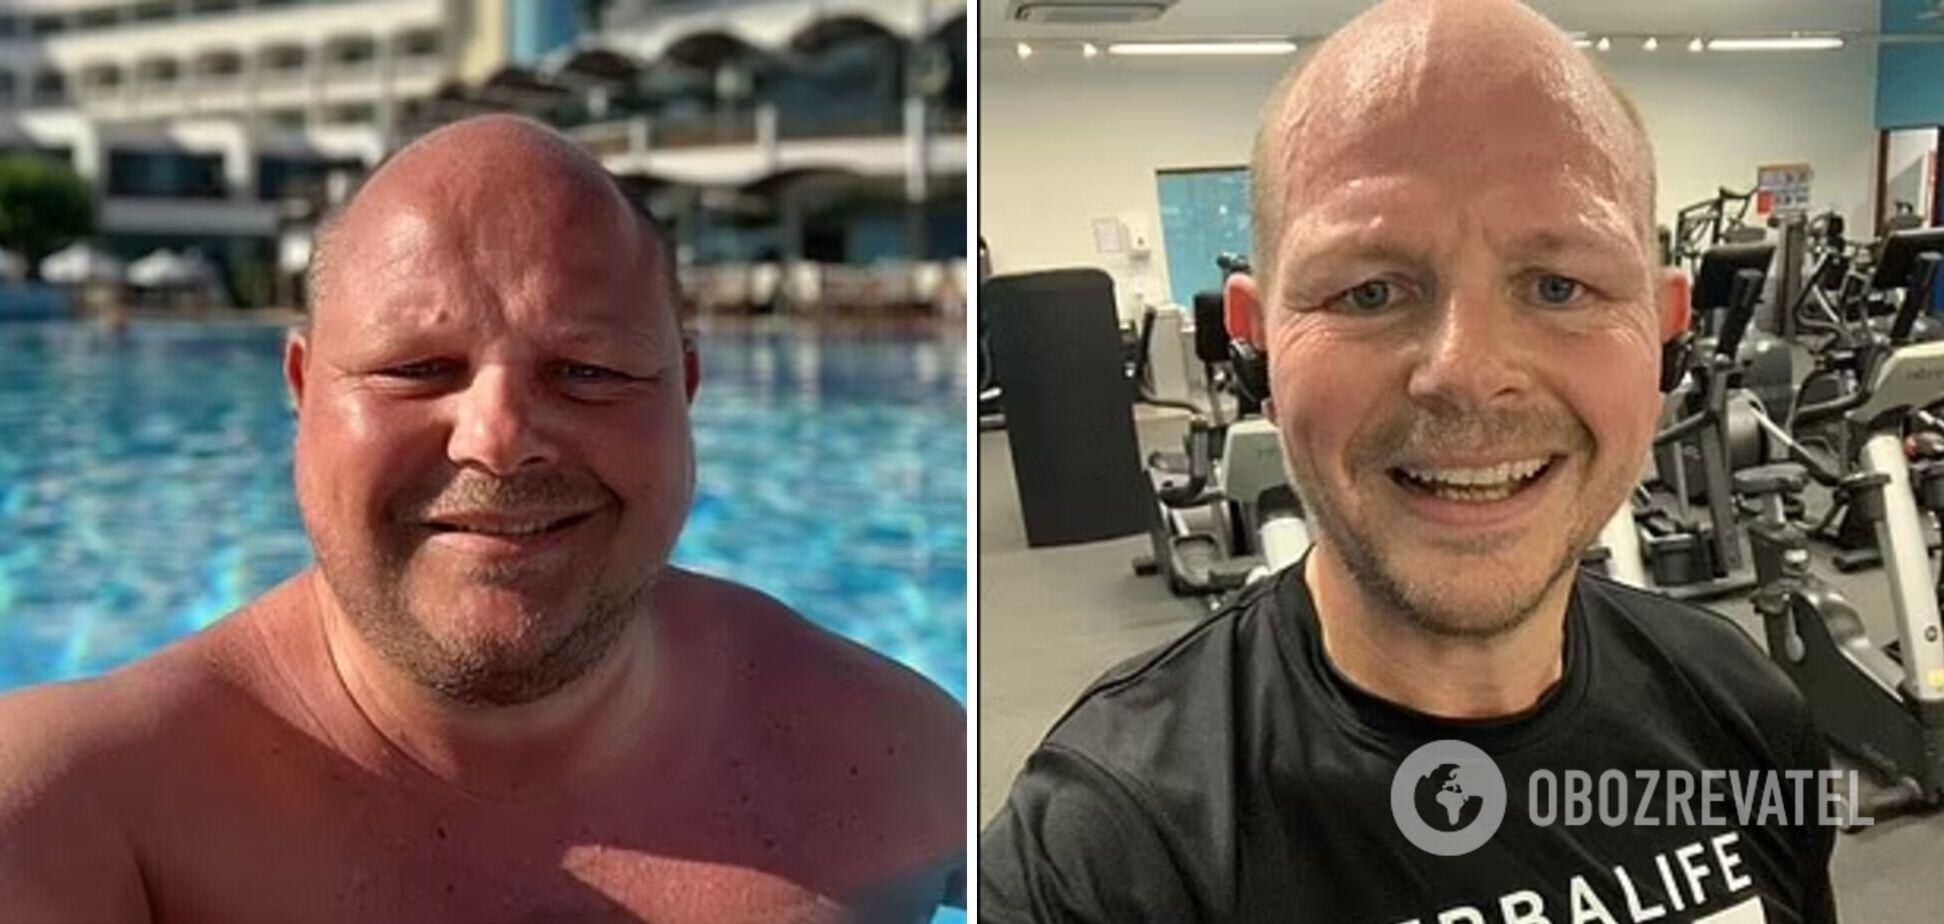 Мужчина сбросил 43 килограмма и не узнал себя. Фото до и после